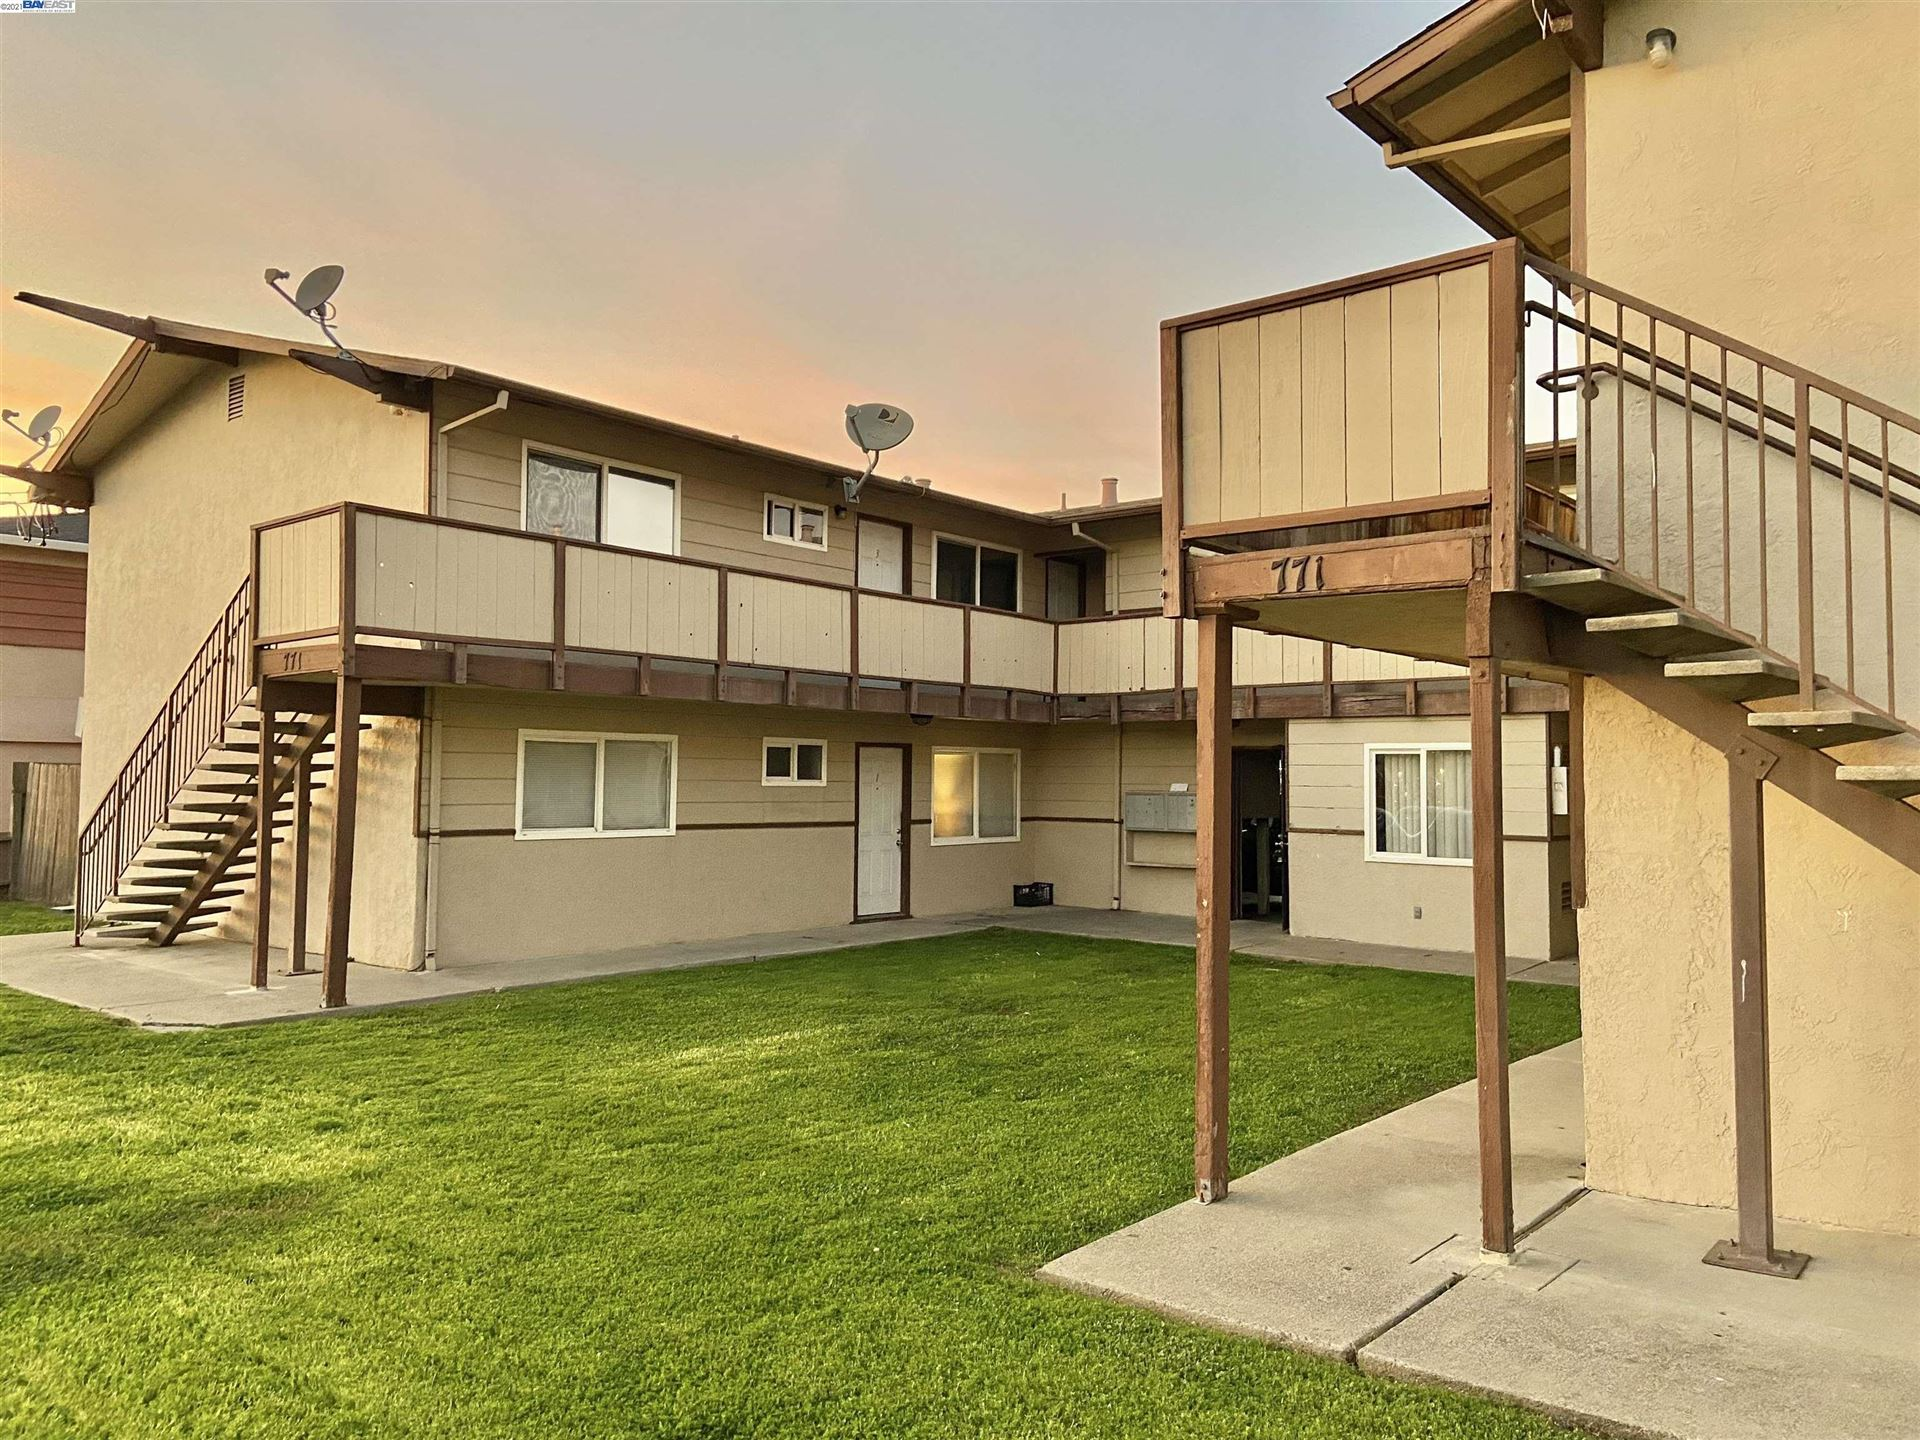 771 Memorial, Hayward, CA 94541 - #: 40966266